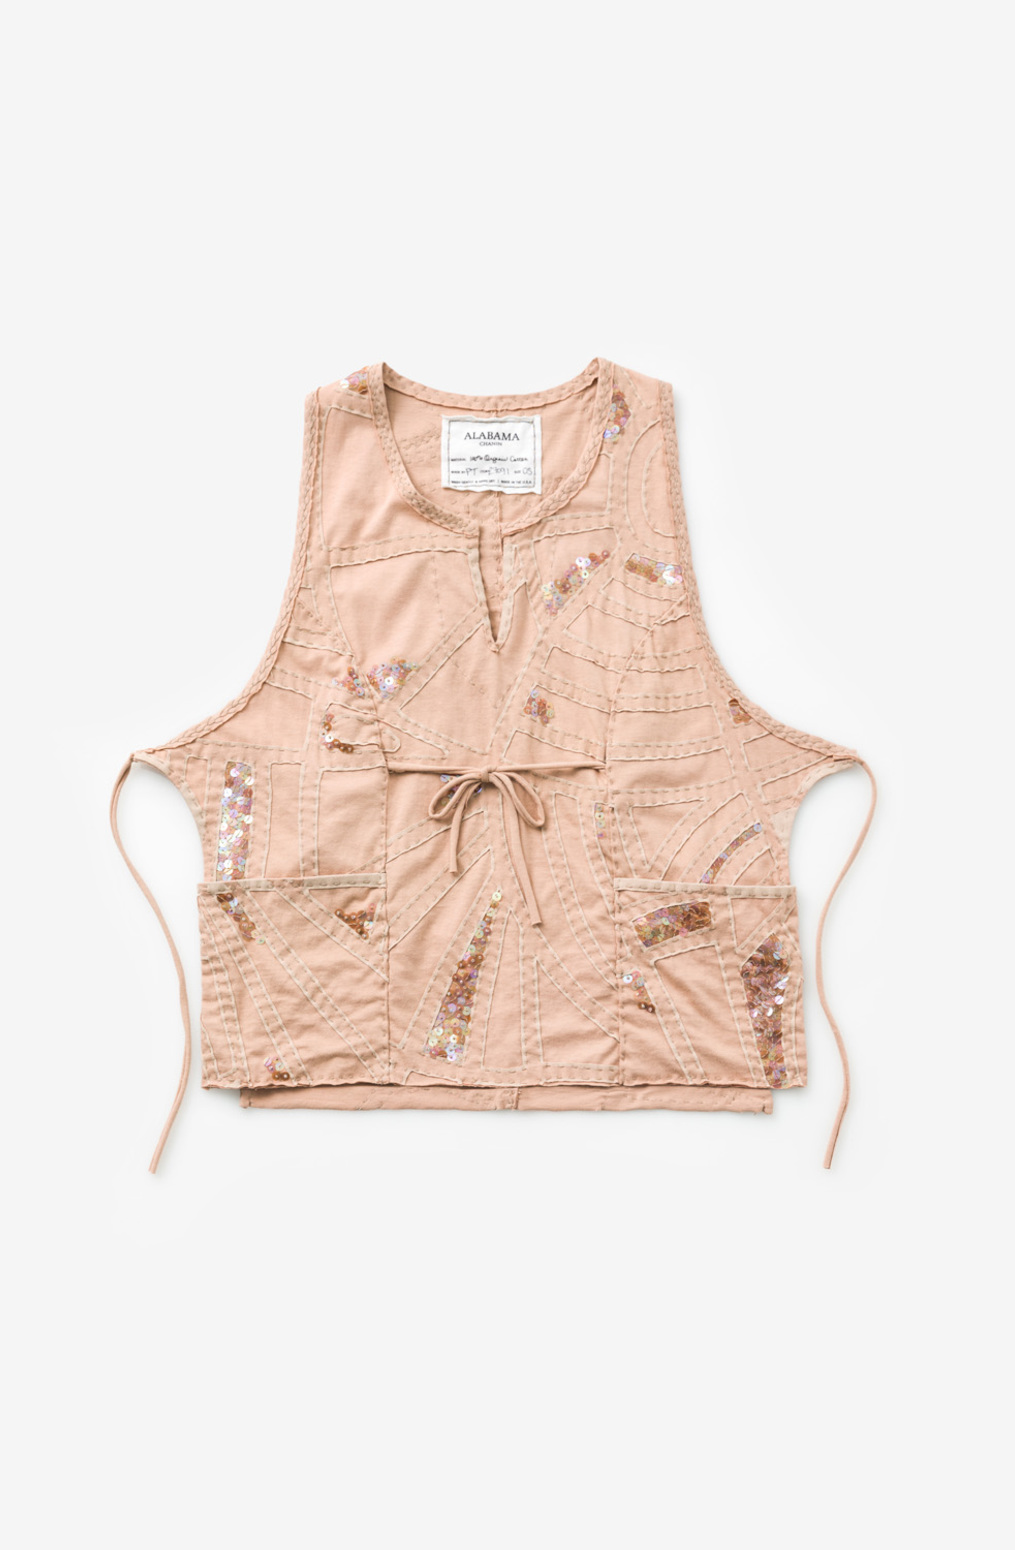 Alabama chanin  organic cotton  womens smock top  tweed  applique